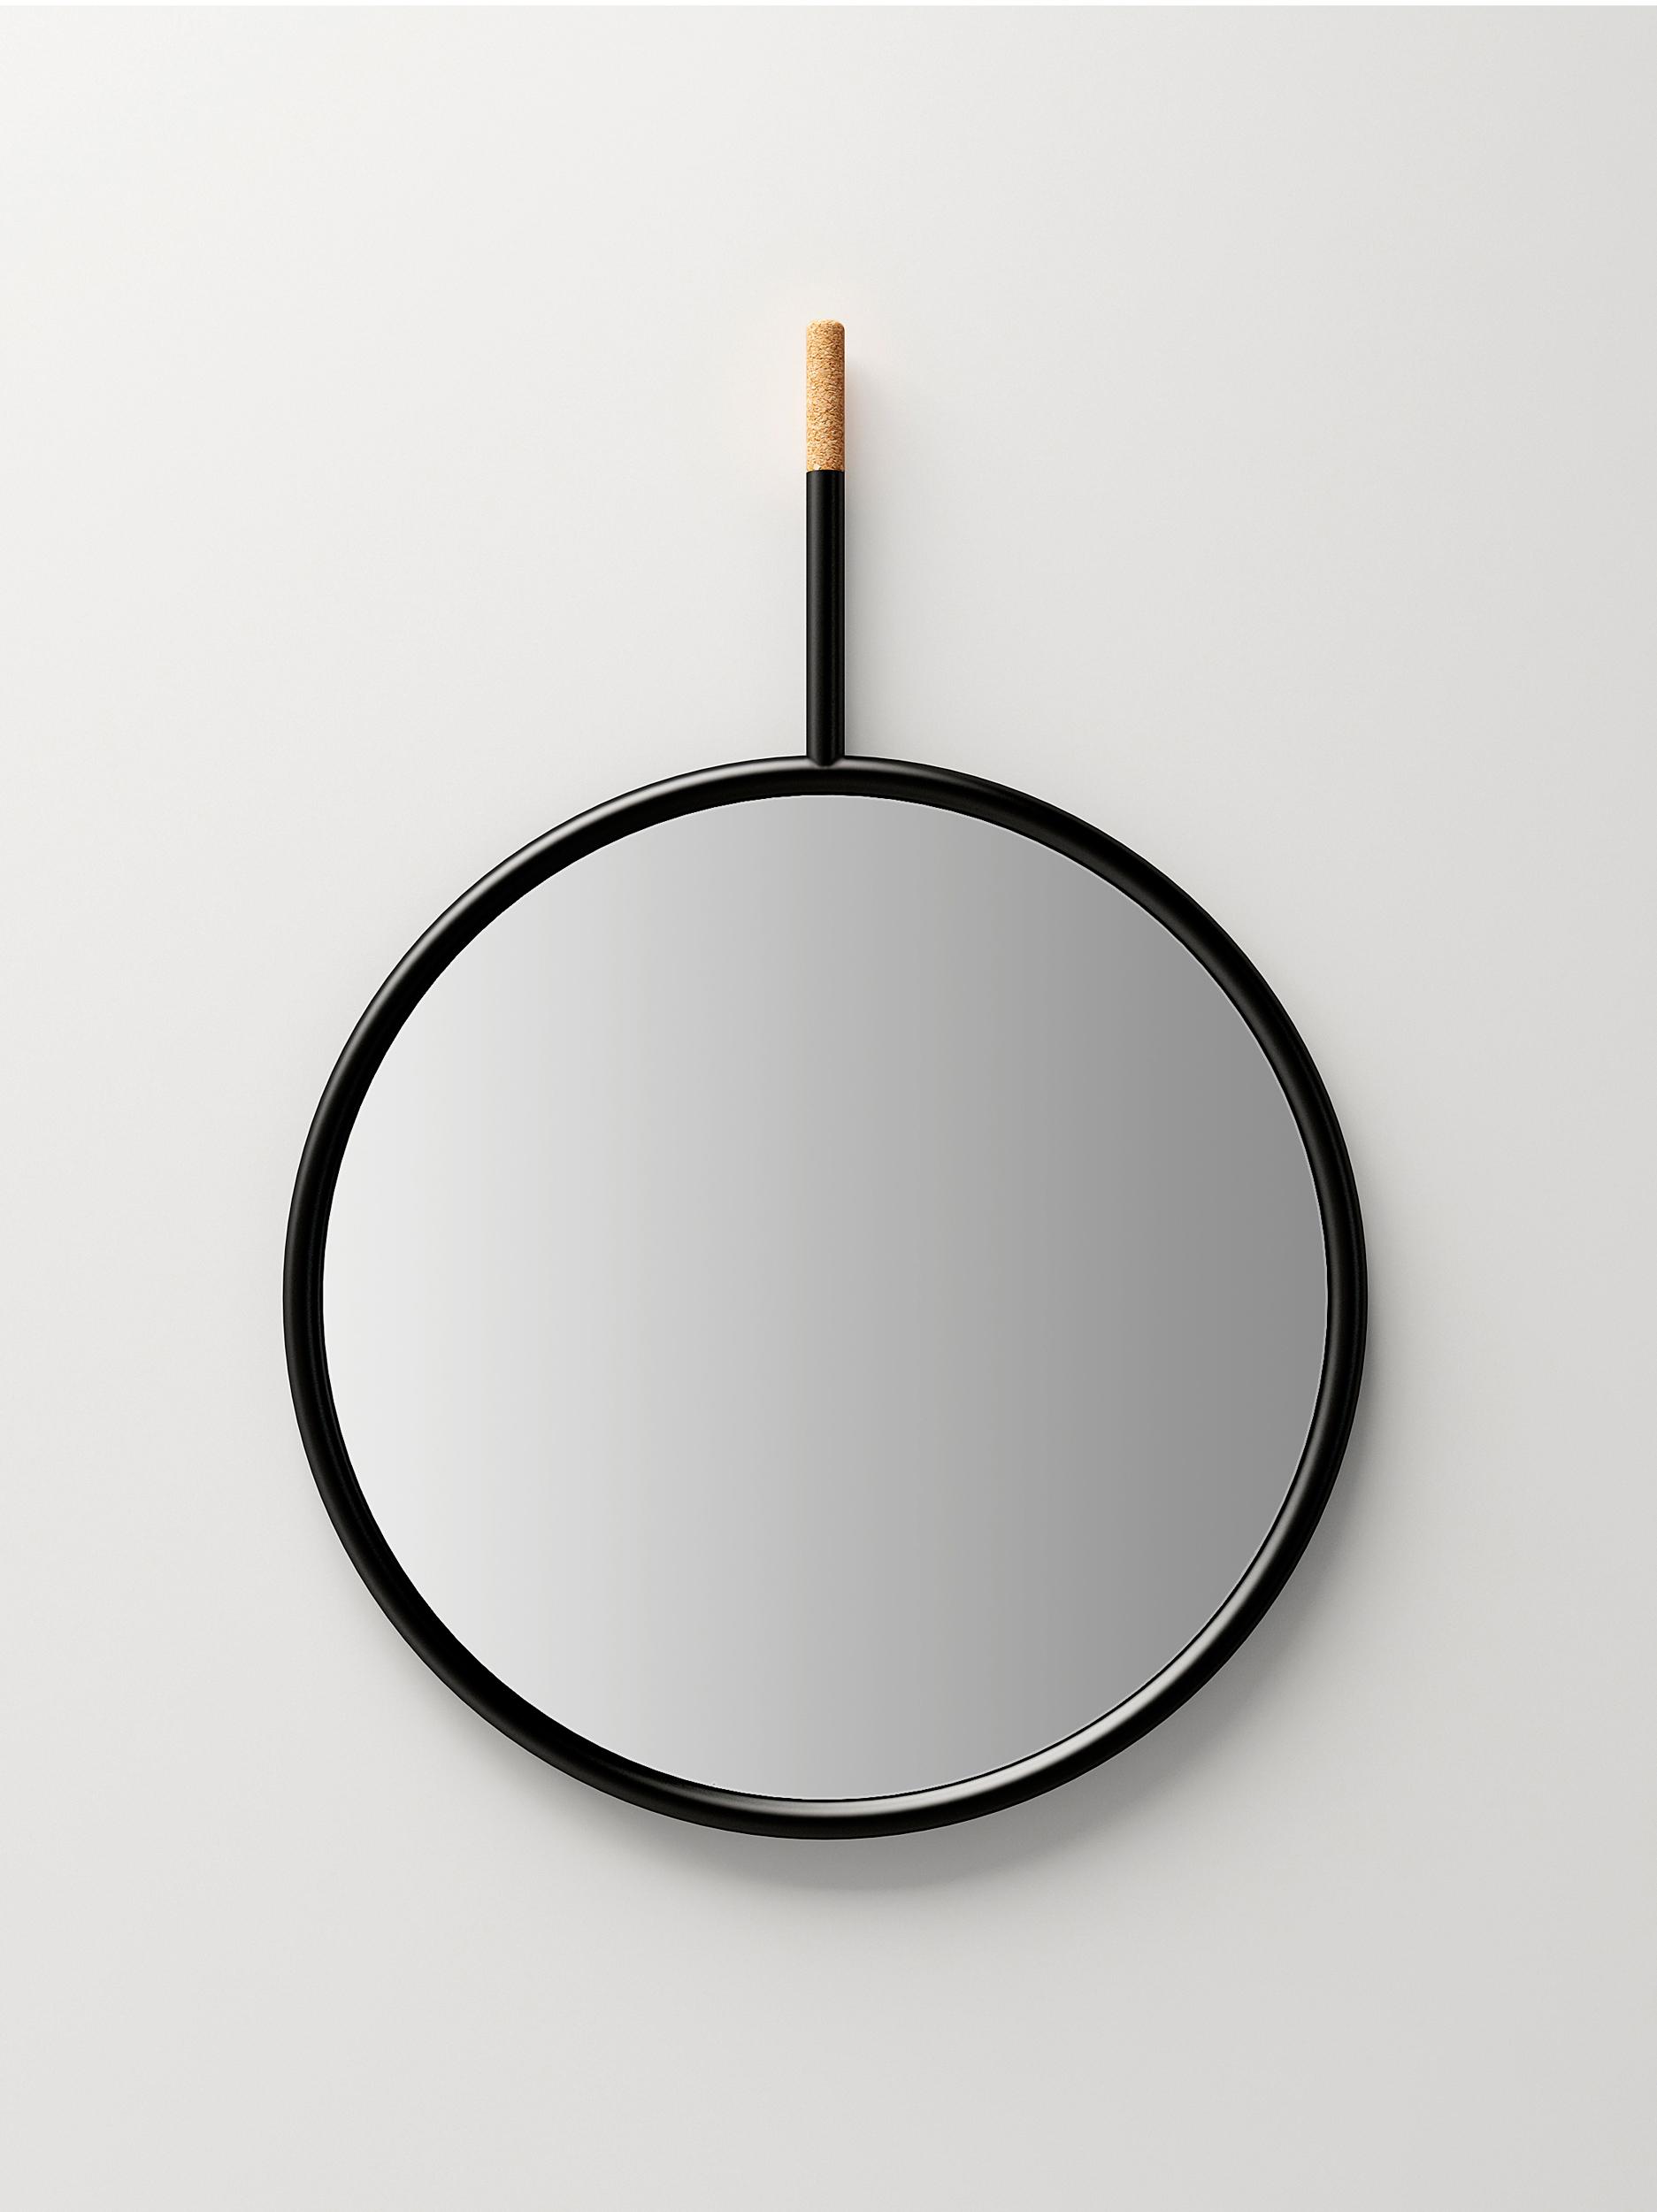 Mirror-Collection_11.jpg